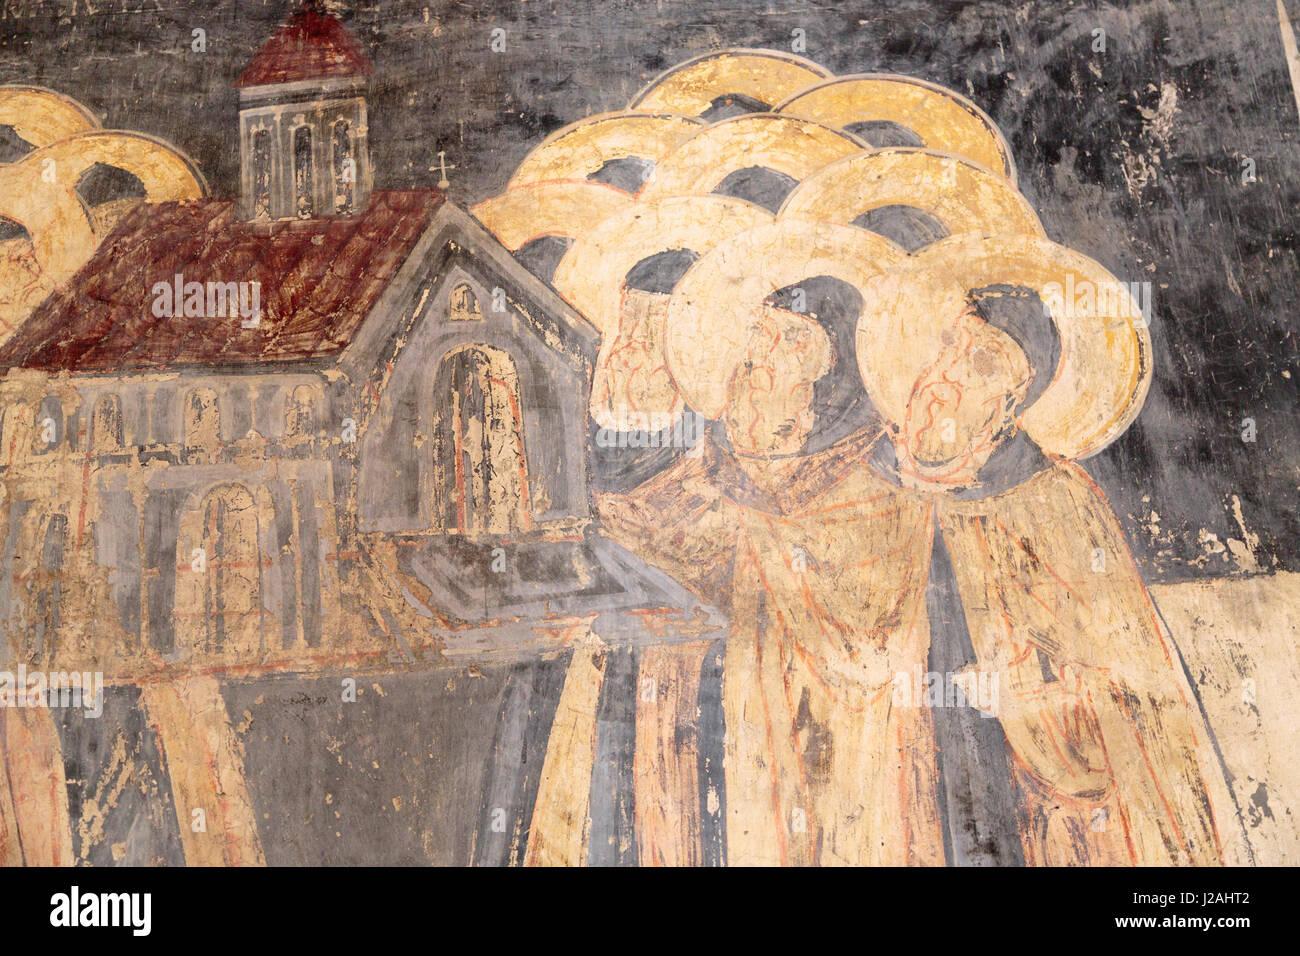 La Georgia, Mtskheta. Arte religiosa nella cattedrale di Svetitskhoveli. Immagini Stock